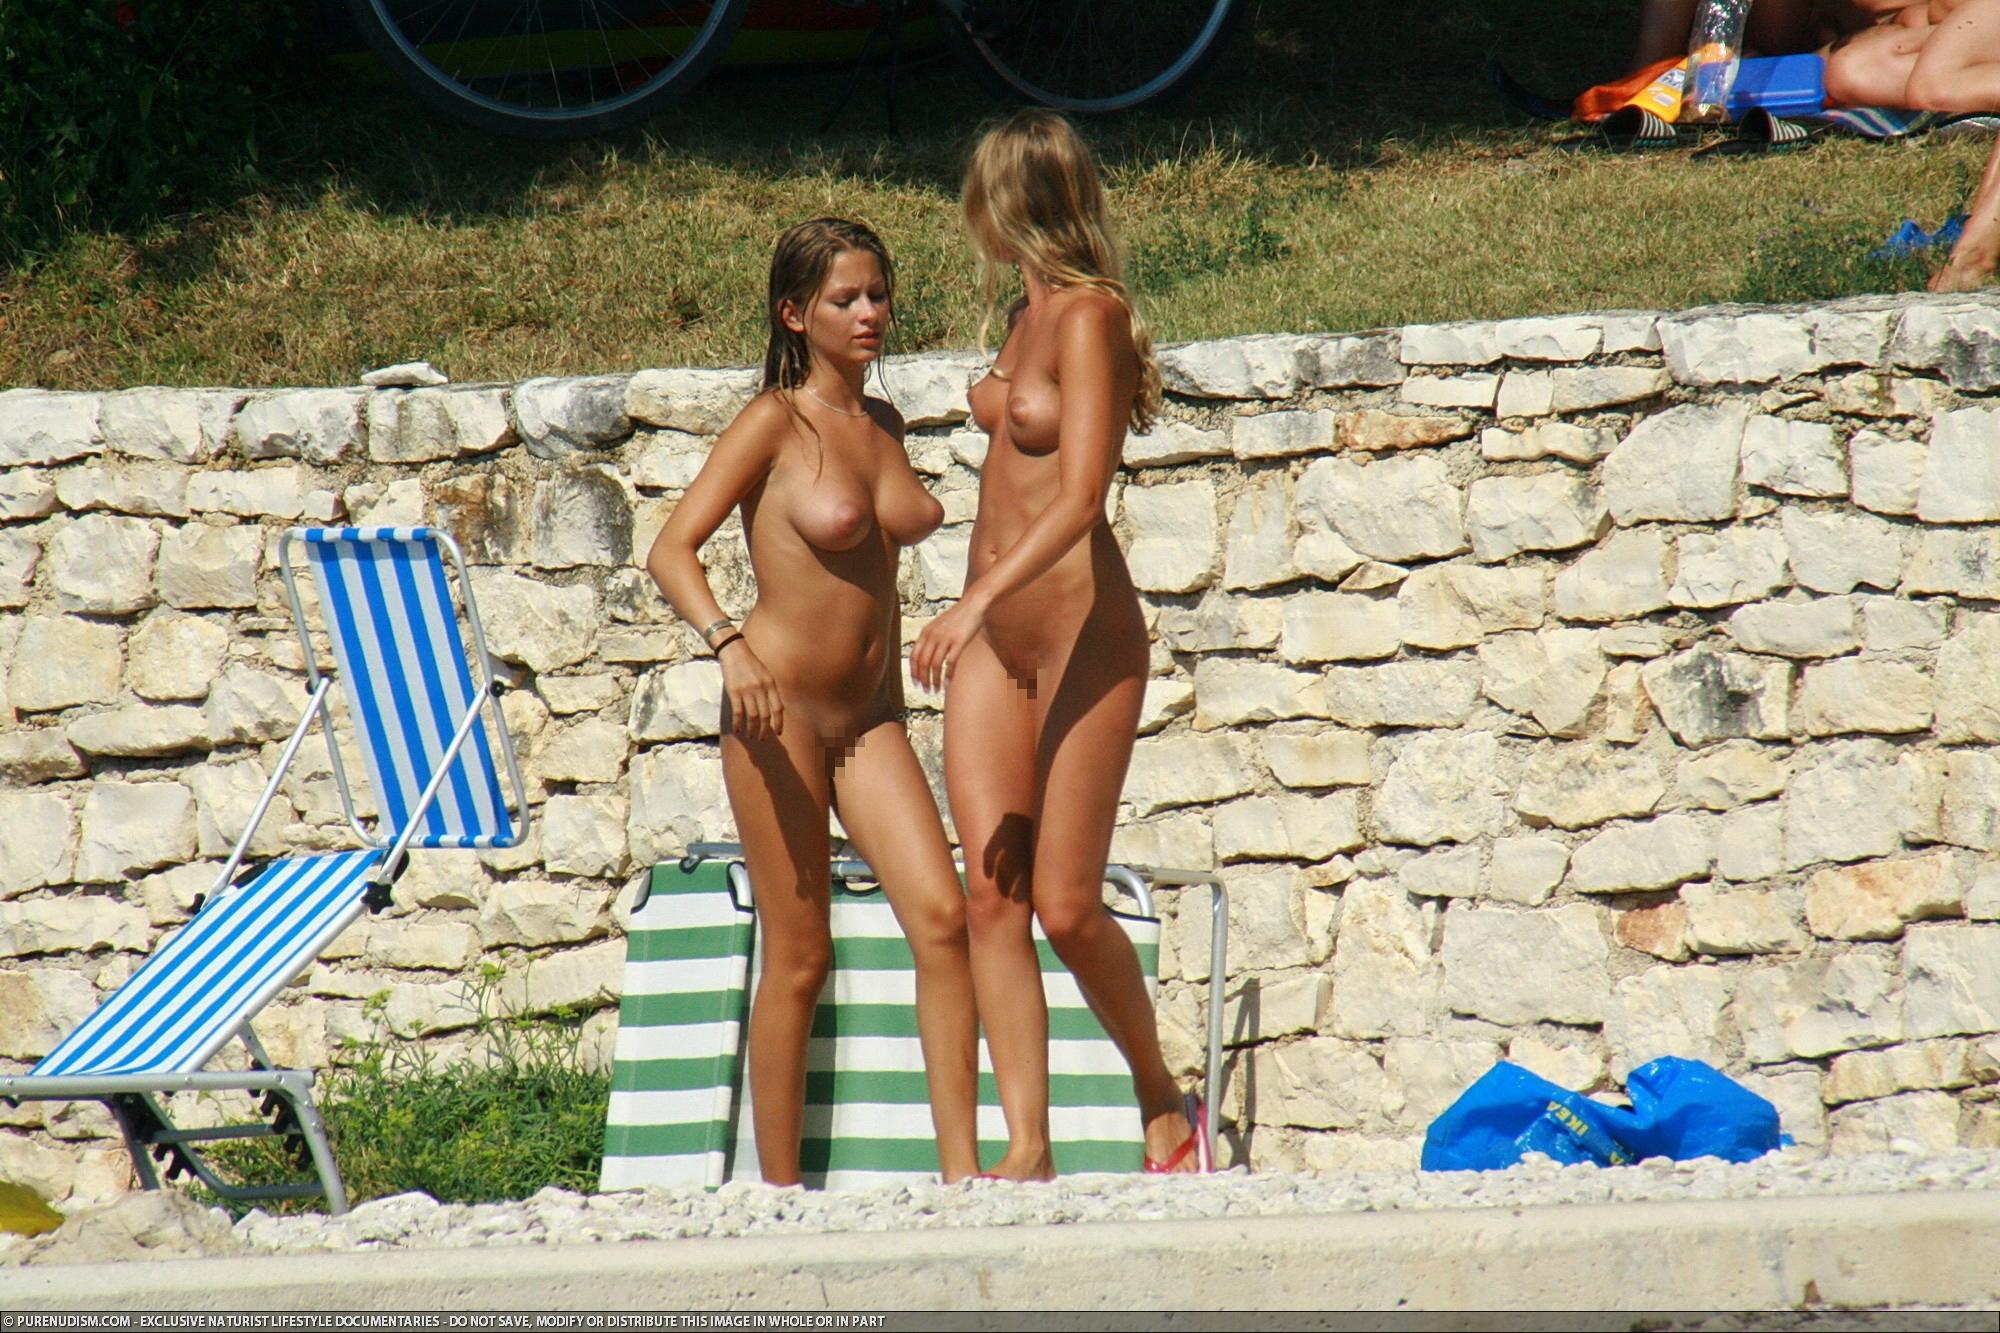 naturist lifestyle documentaries 1-1027 (17)